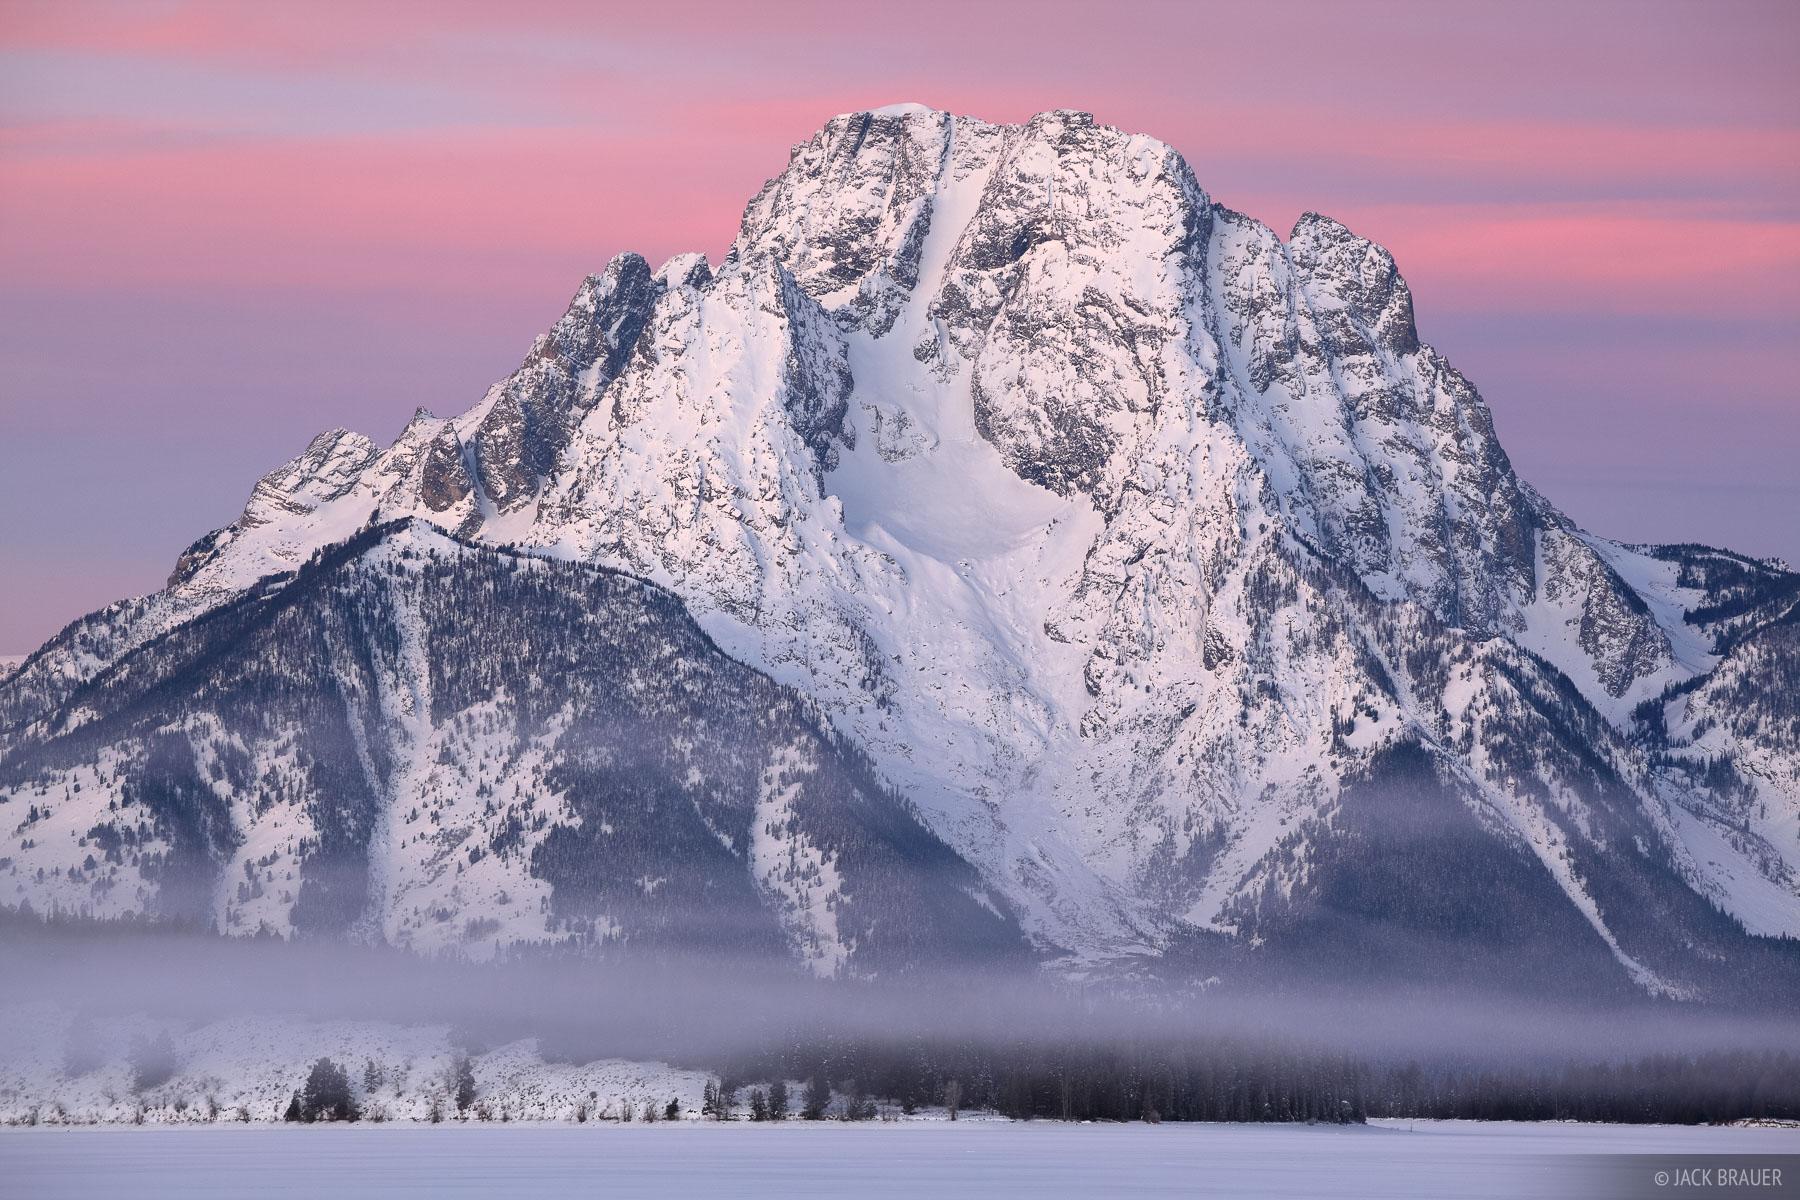 Jackson Lake, Tetons, Wyoming, Mt. Moran, Grand Teton National Park, photo